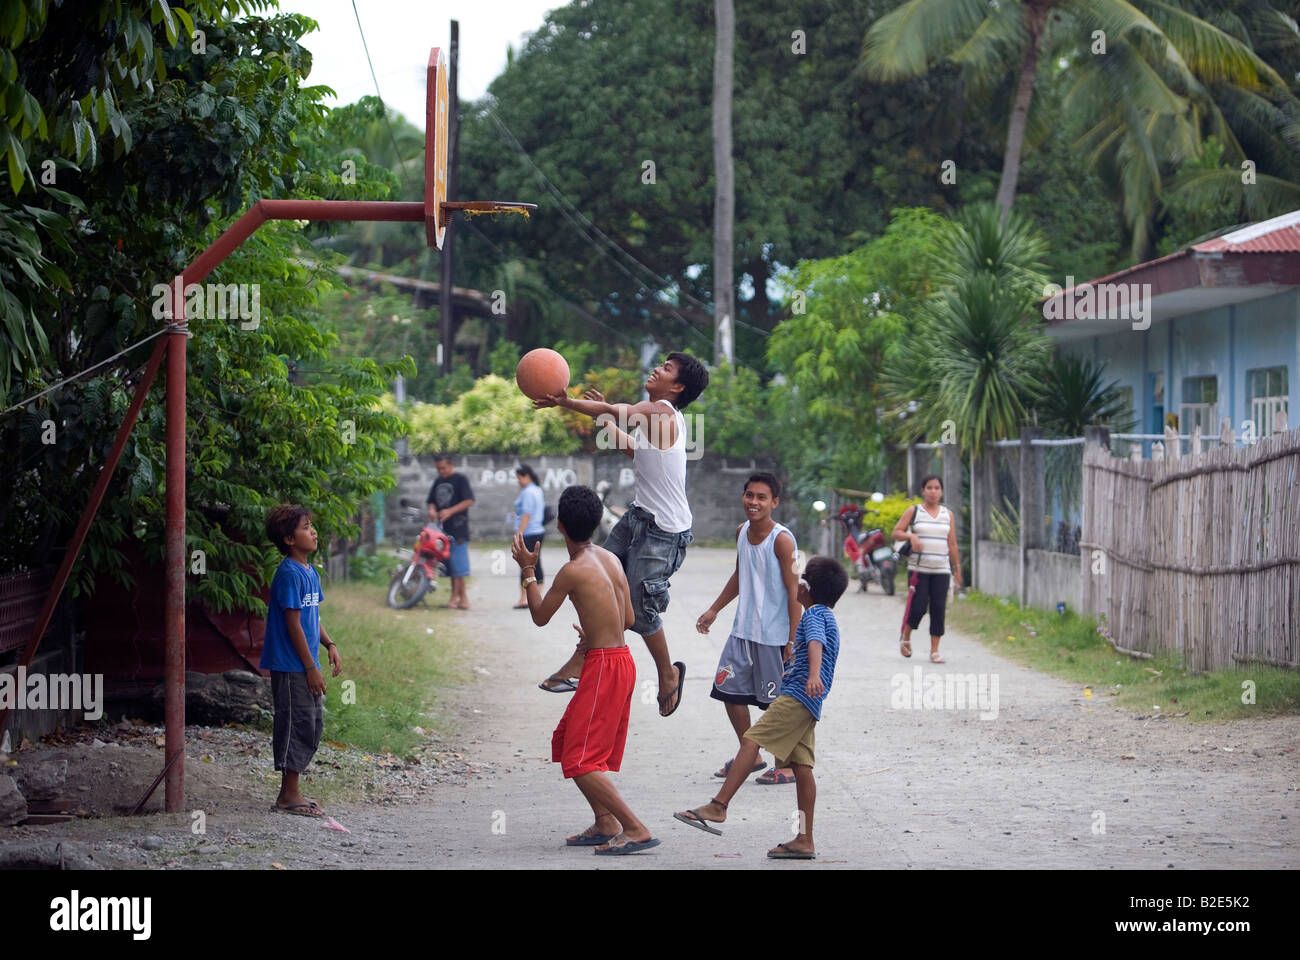 Filipino Children Play Basketball On A Street In Mansalay